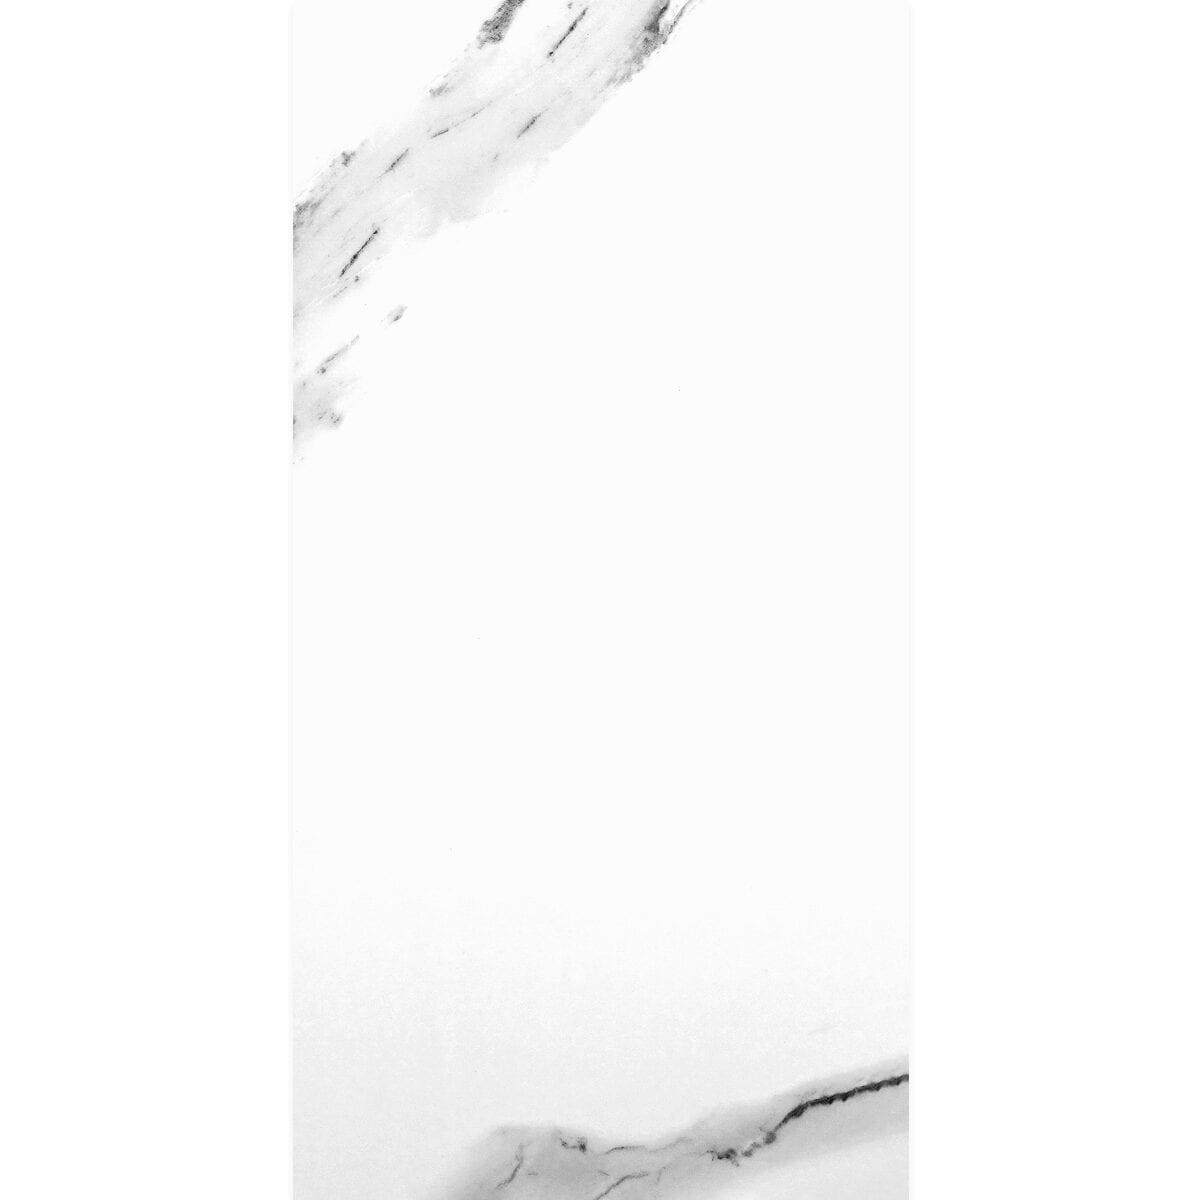 t10953 finland snow powder v2